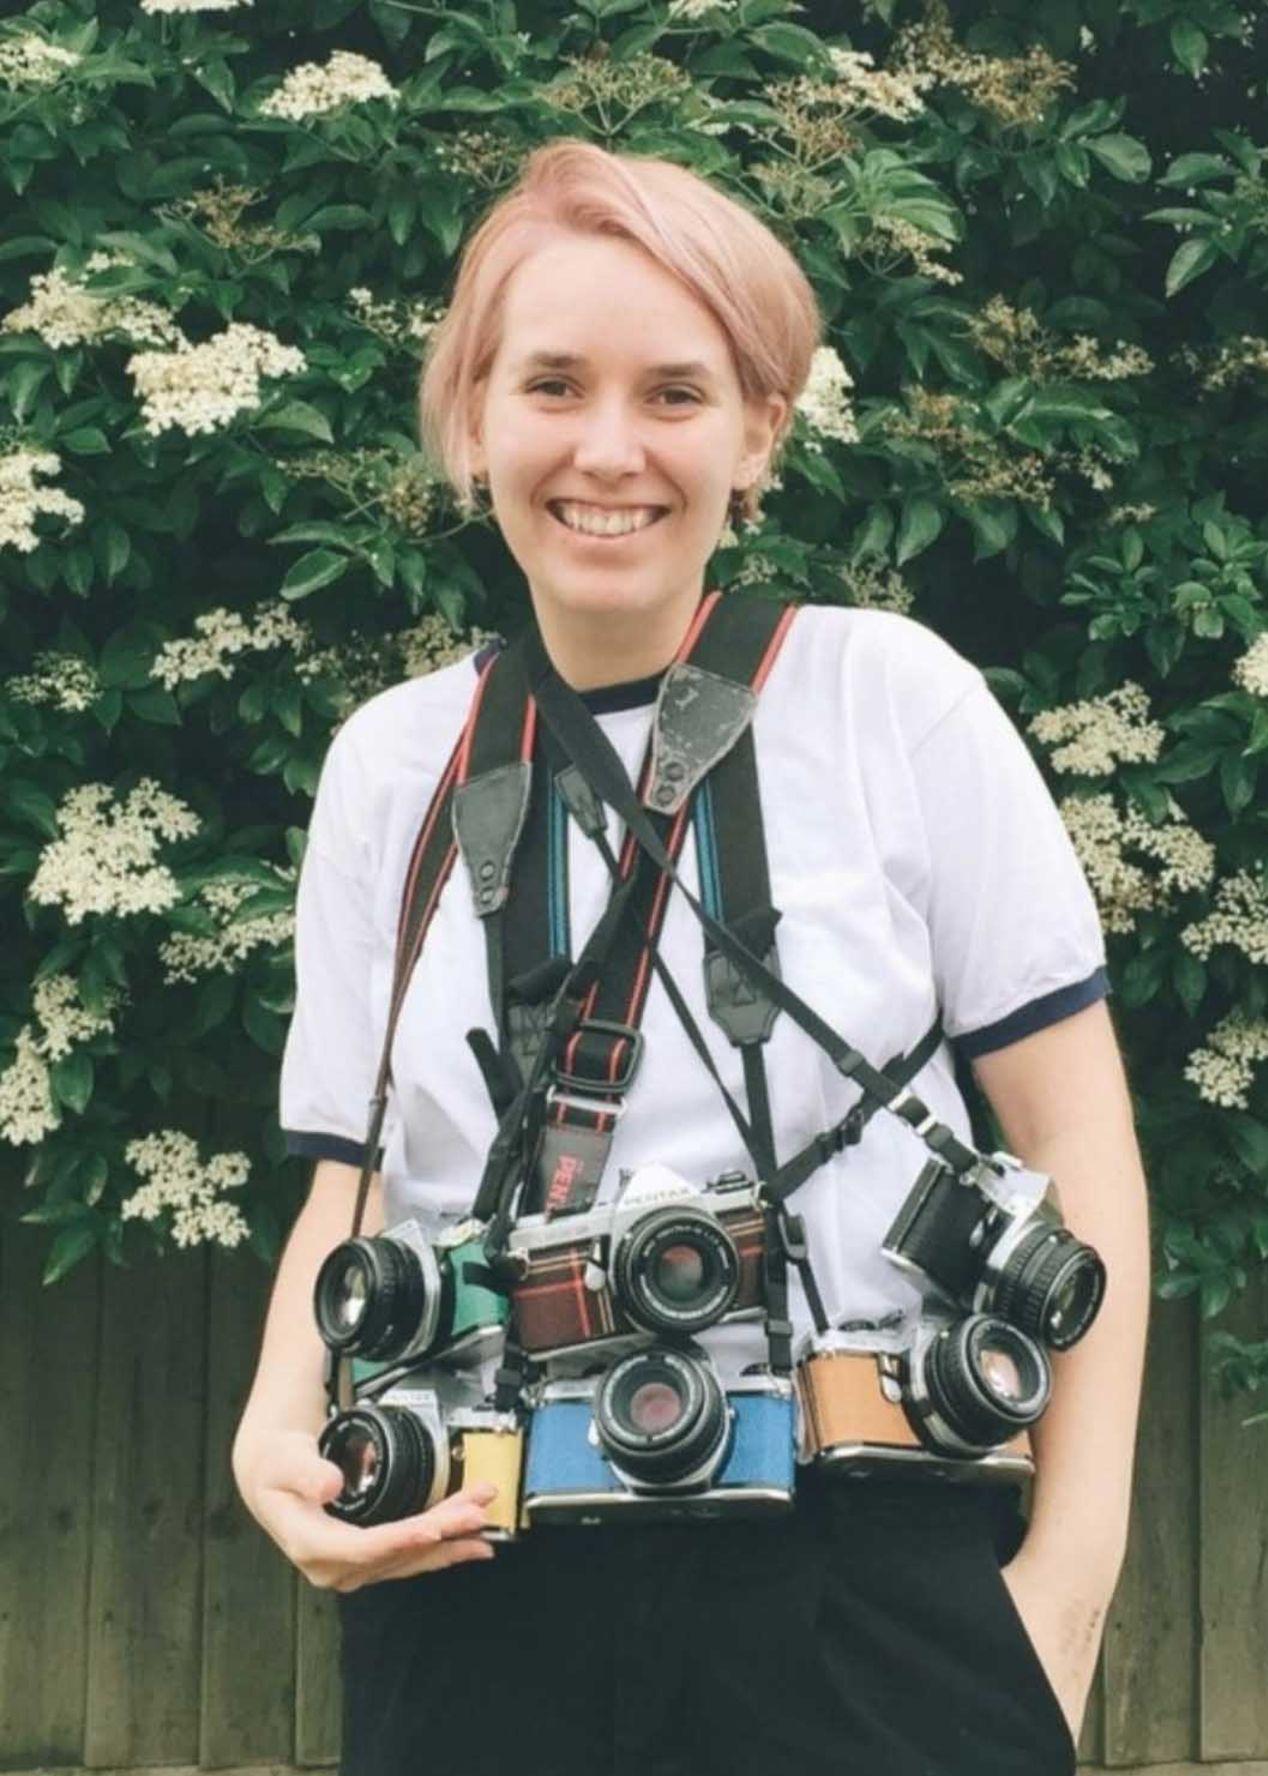 Marina Llopis and her beloved Pentax cameras.